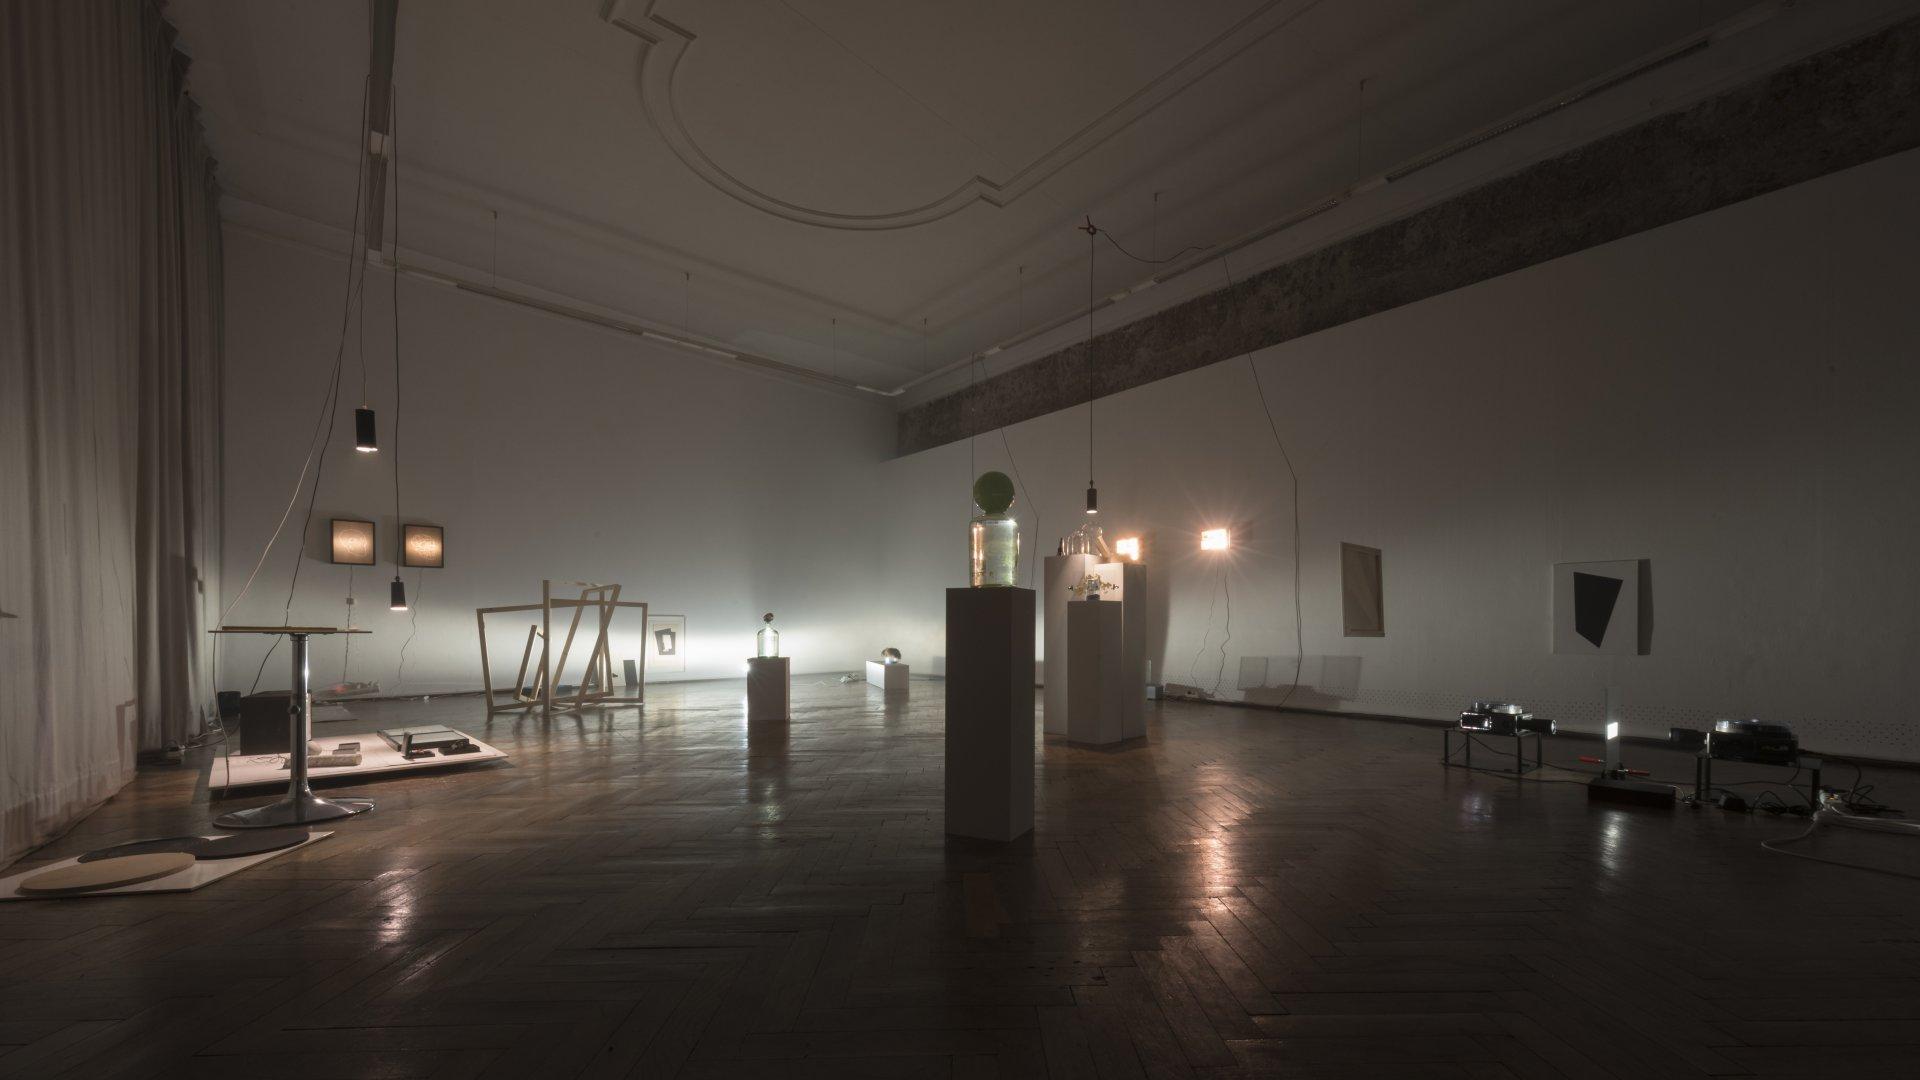 1thTotaIe_Installation_ExperimentalSetup_Kuenstlerhaus_Buechsenhausen_Innsbruck_Austellungsansicht2_KATA_BOSKO_2018